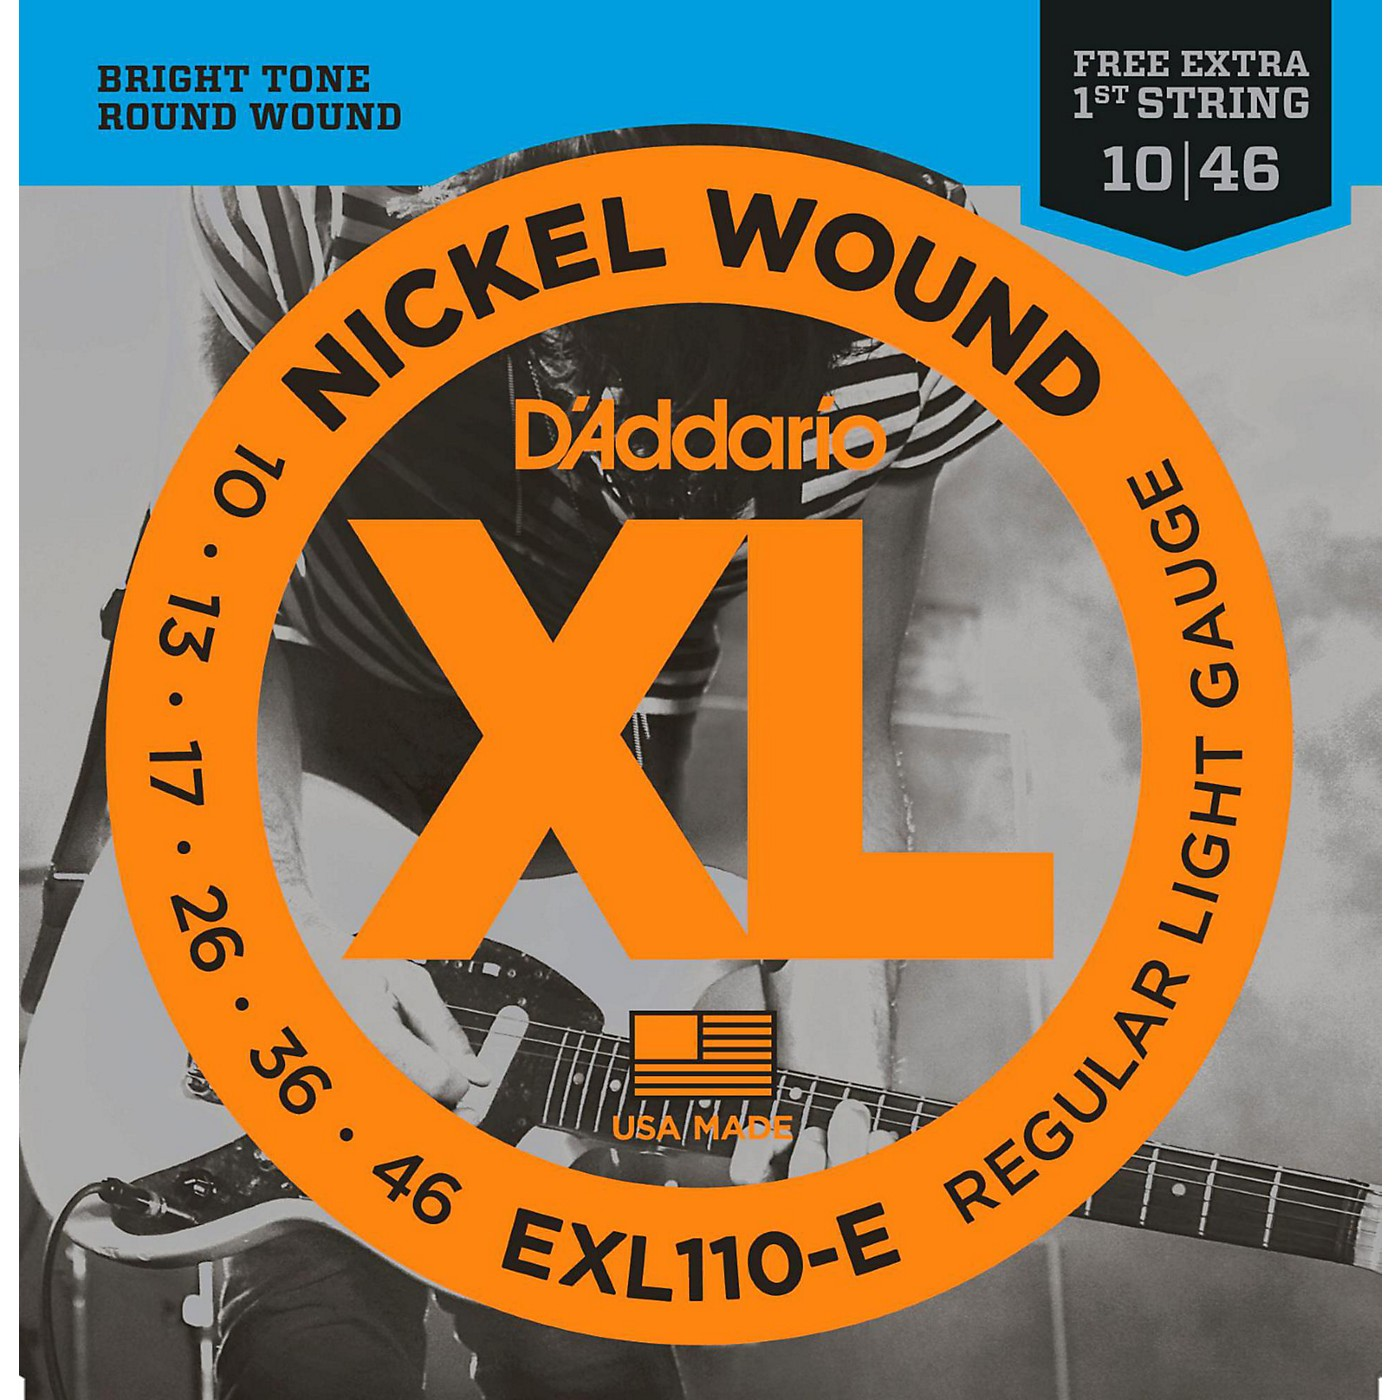 D'Addario EXL110-E Bonus Pack: Light Electric Guitar Strings with Bonus High E String (10-46) thumbnail